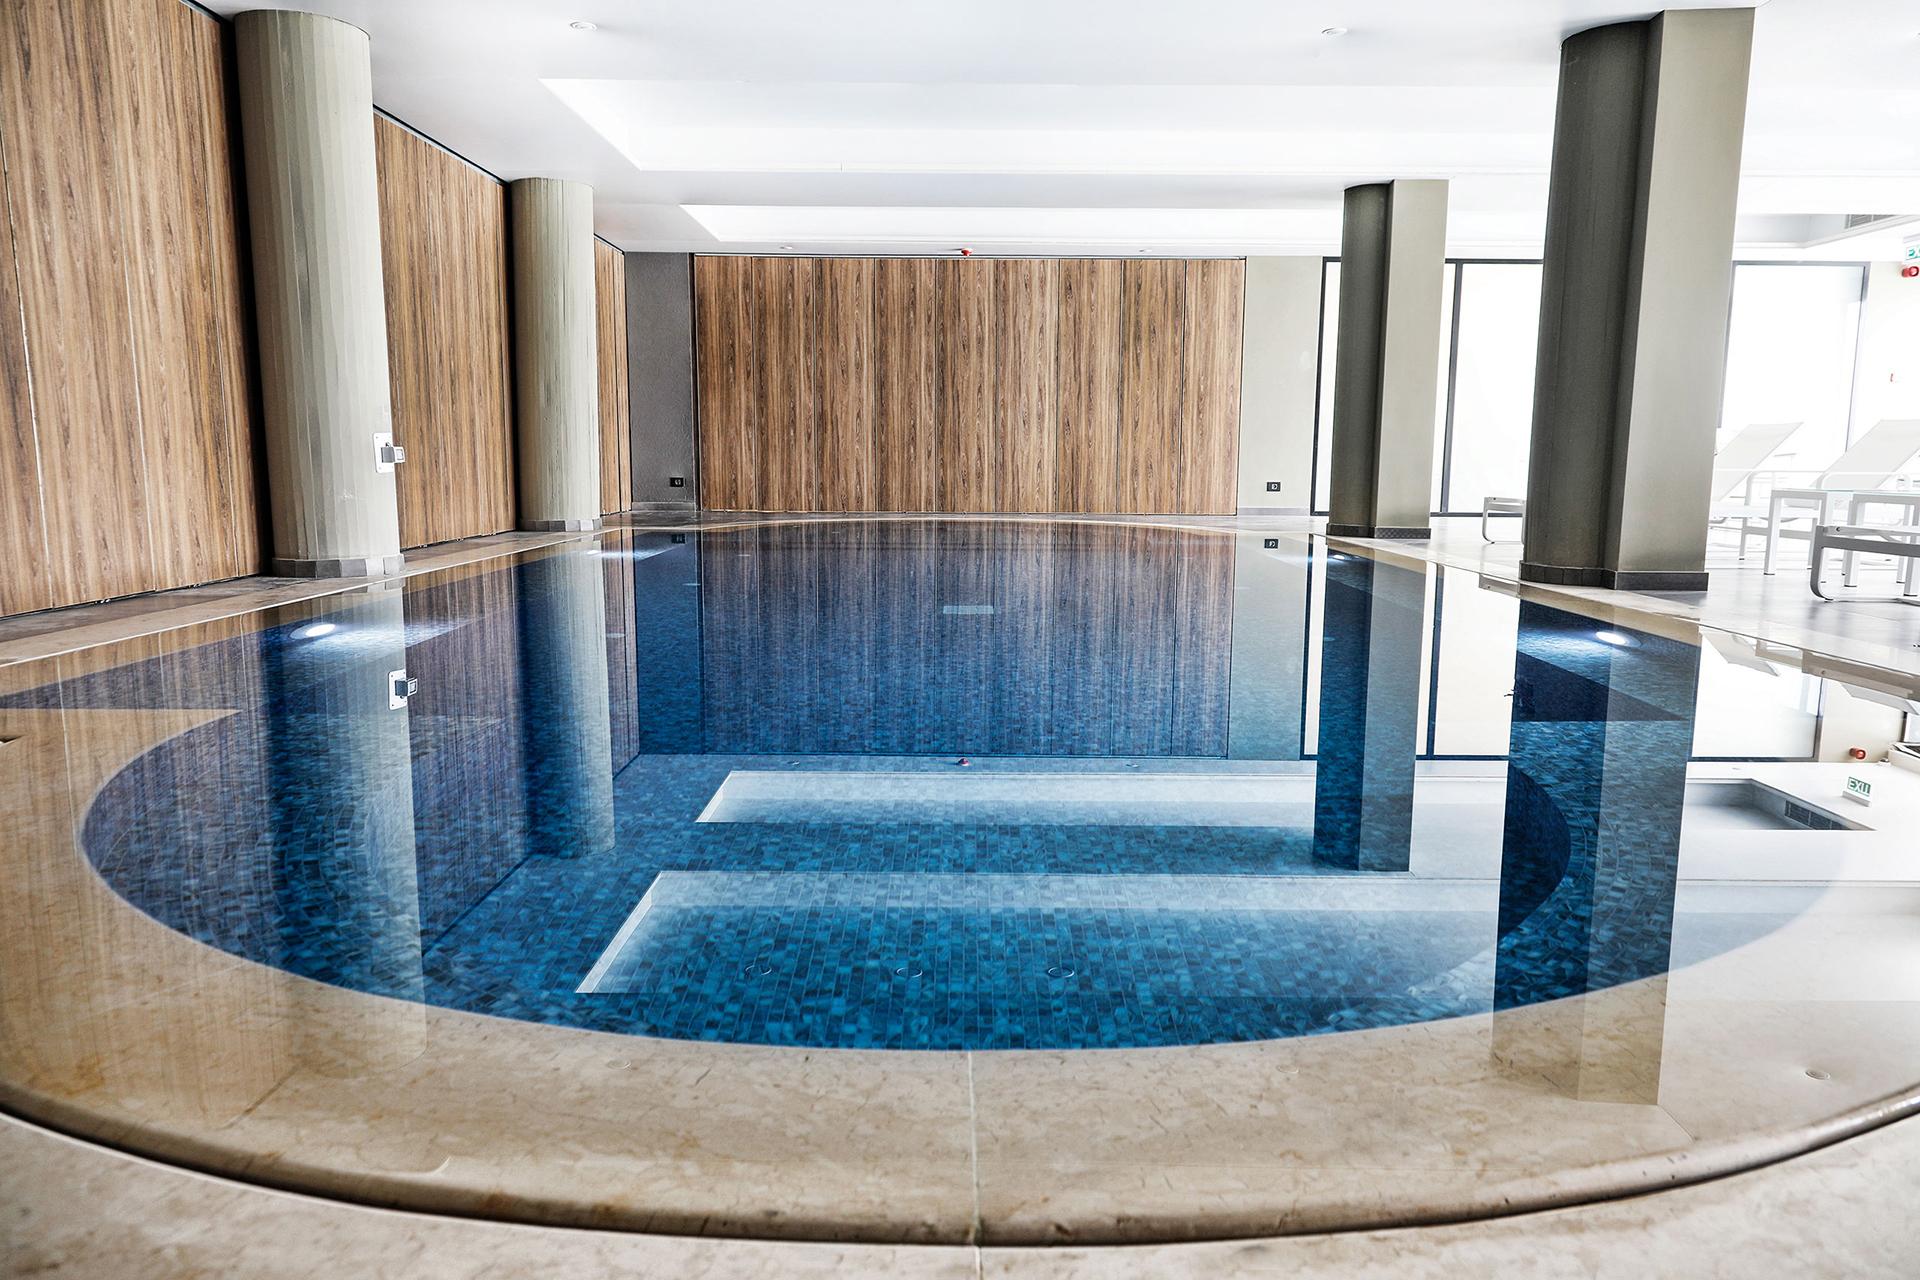 Le-Pave-Hotel-Lebanon-Beirut-Inside-Pool-3